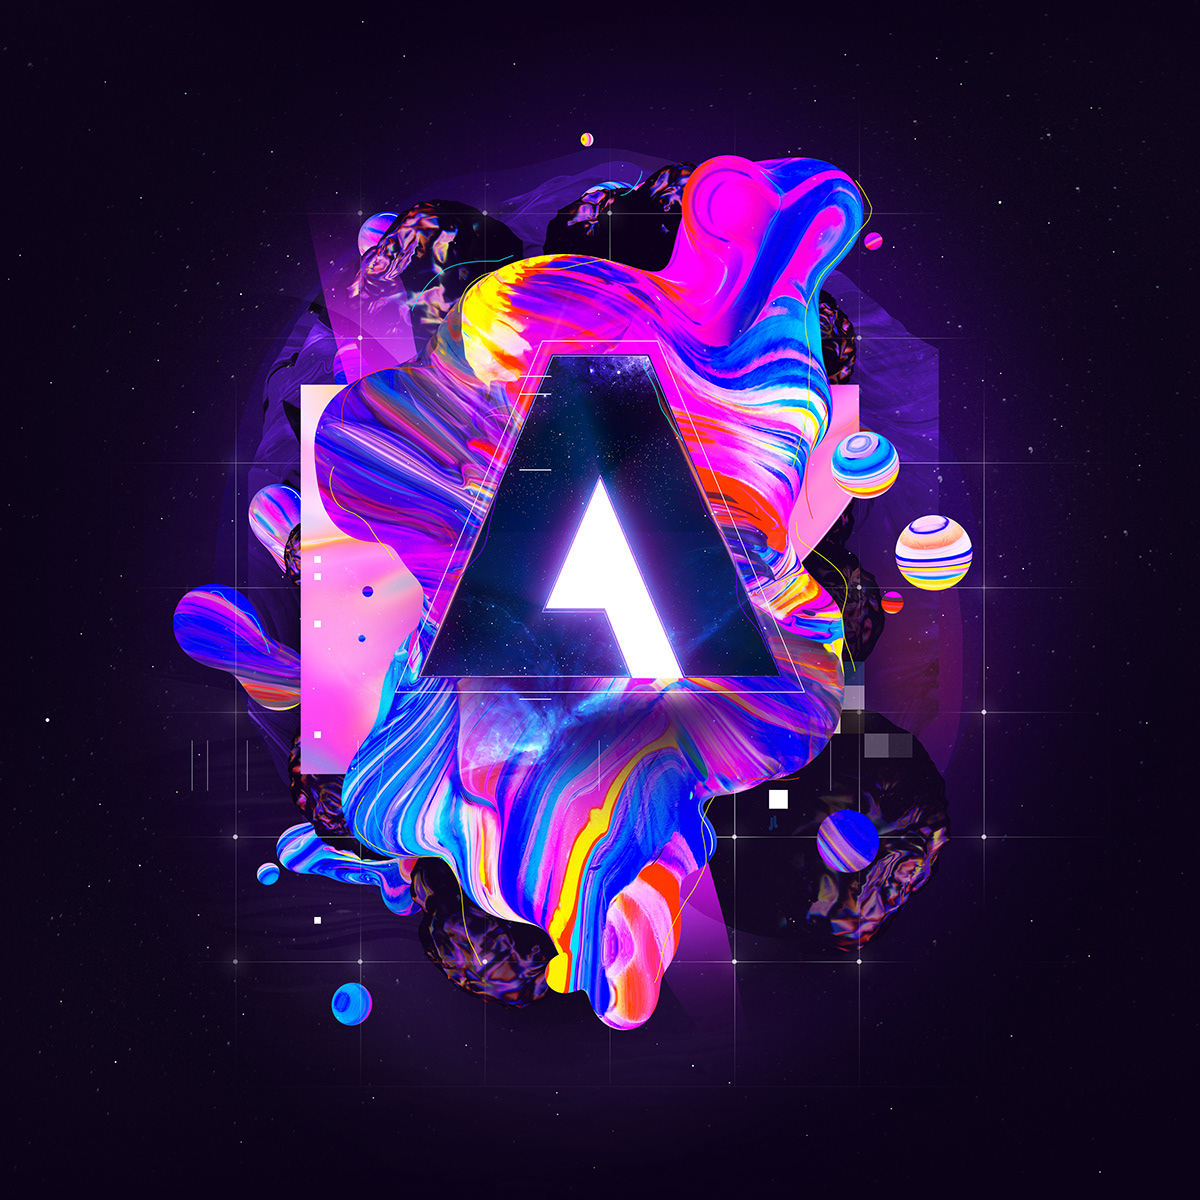 logo design adobe brand NATALIE SHAU digital branding Adobe Remix Adobe Logo Alex trochut The Made Shop Sagmeister & Walsh Andres Amador Robert Hodgin gmunk Goodby